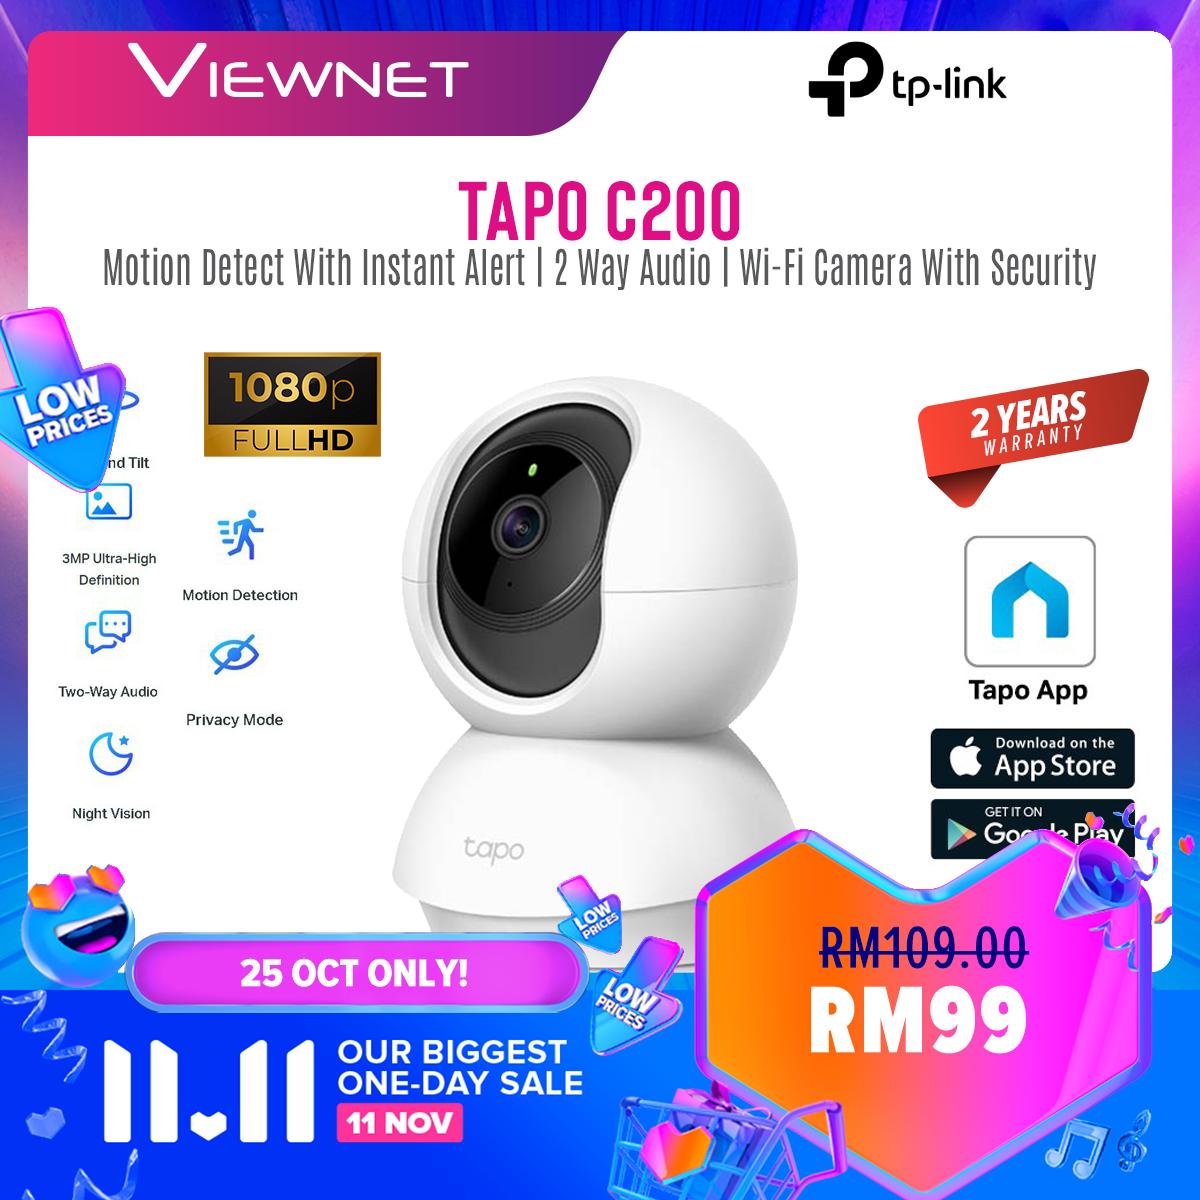 TP-Link Tapo C200 A.K.A TC70 1080P Full HD Pan / Tilt Wireless WiFi Home Security Surveillance IP Camera